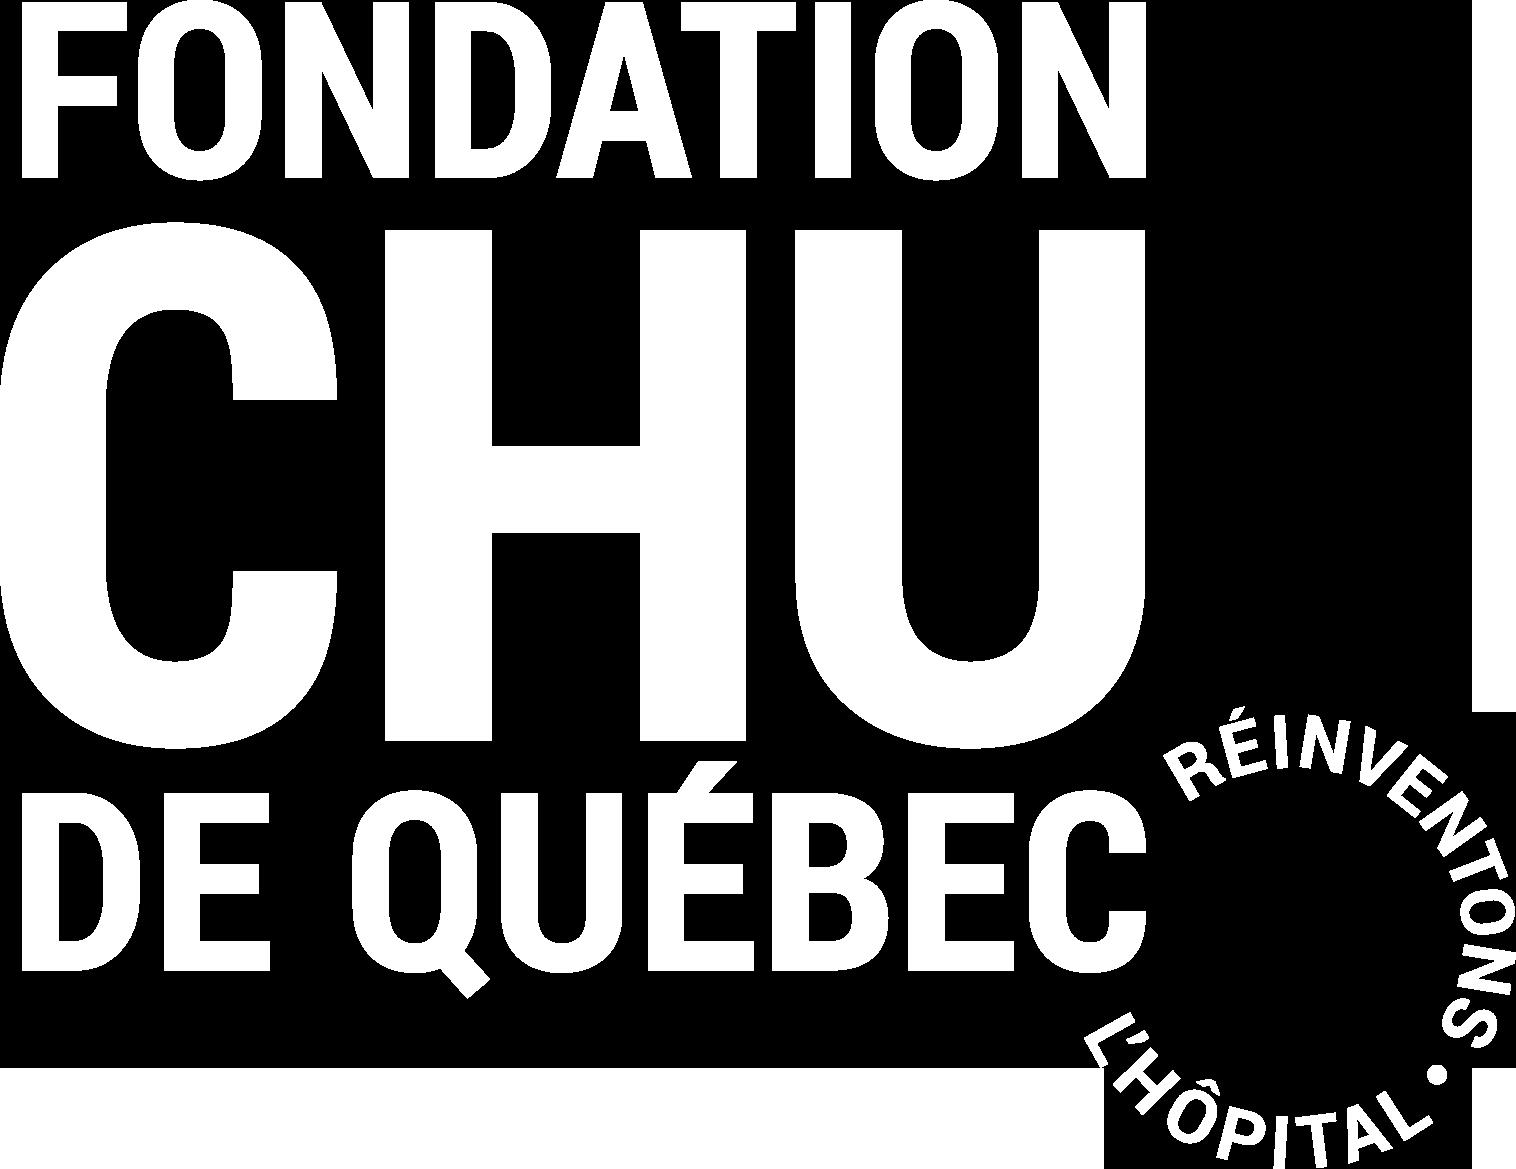 #FondationDuChuDeQuebec #FCHUQC #FCHUQClogo